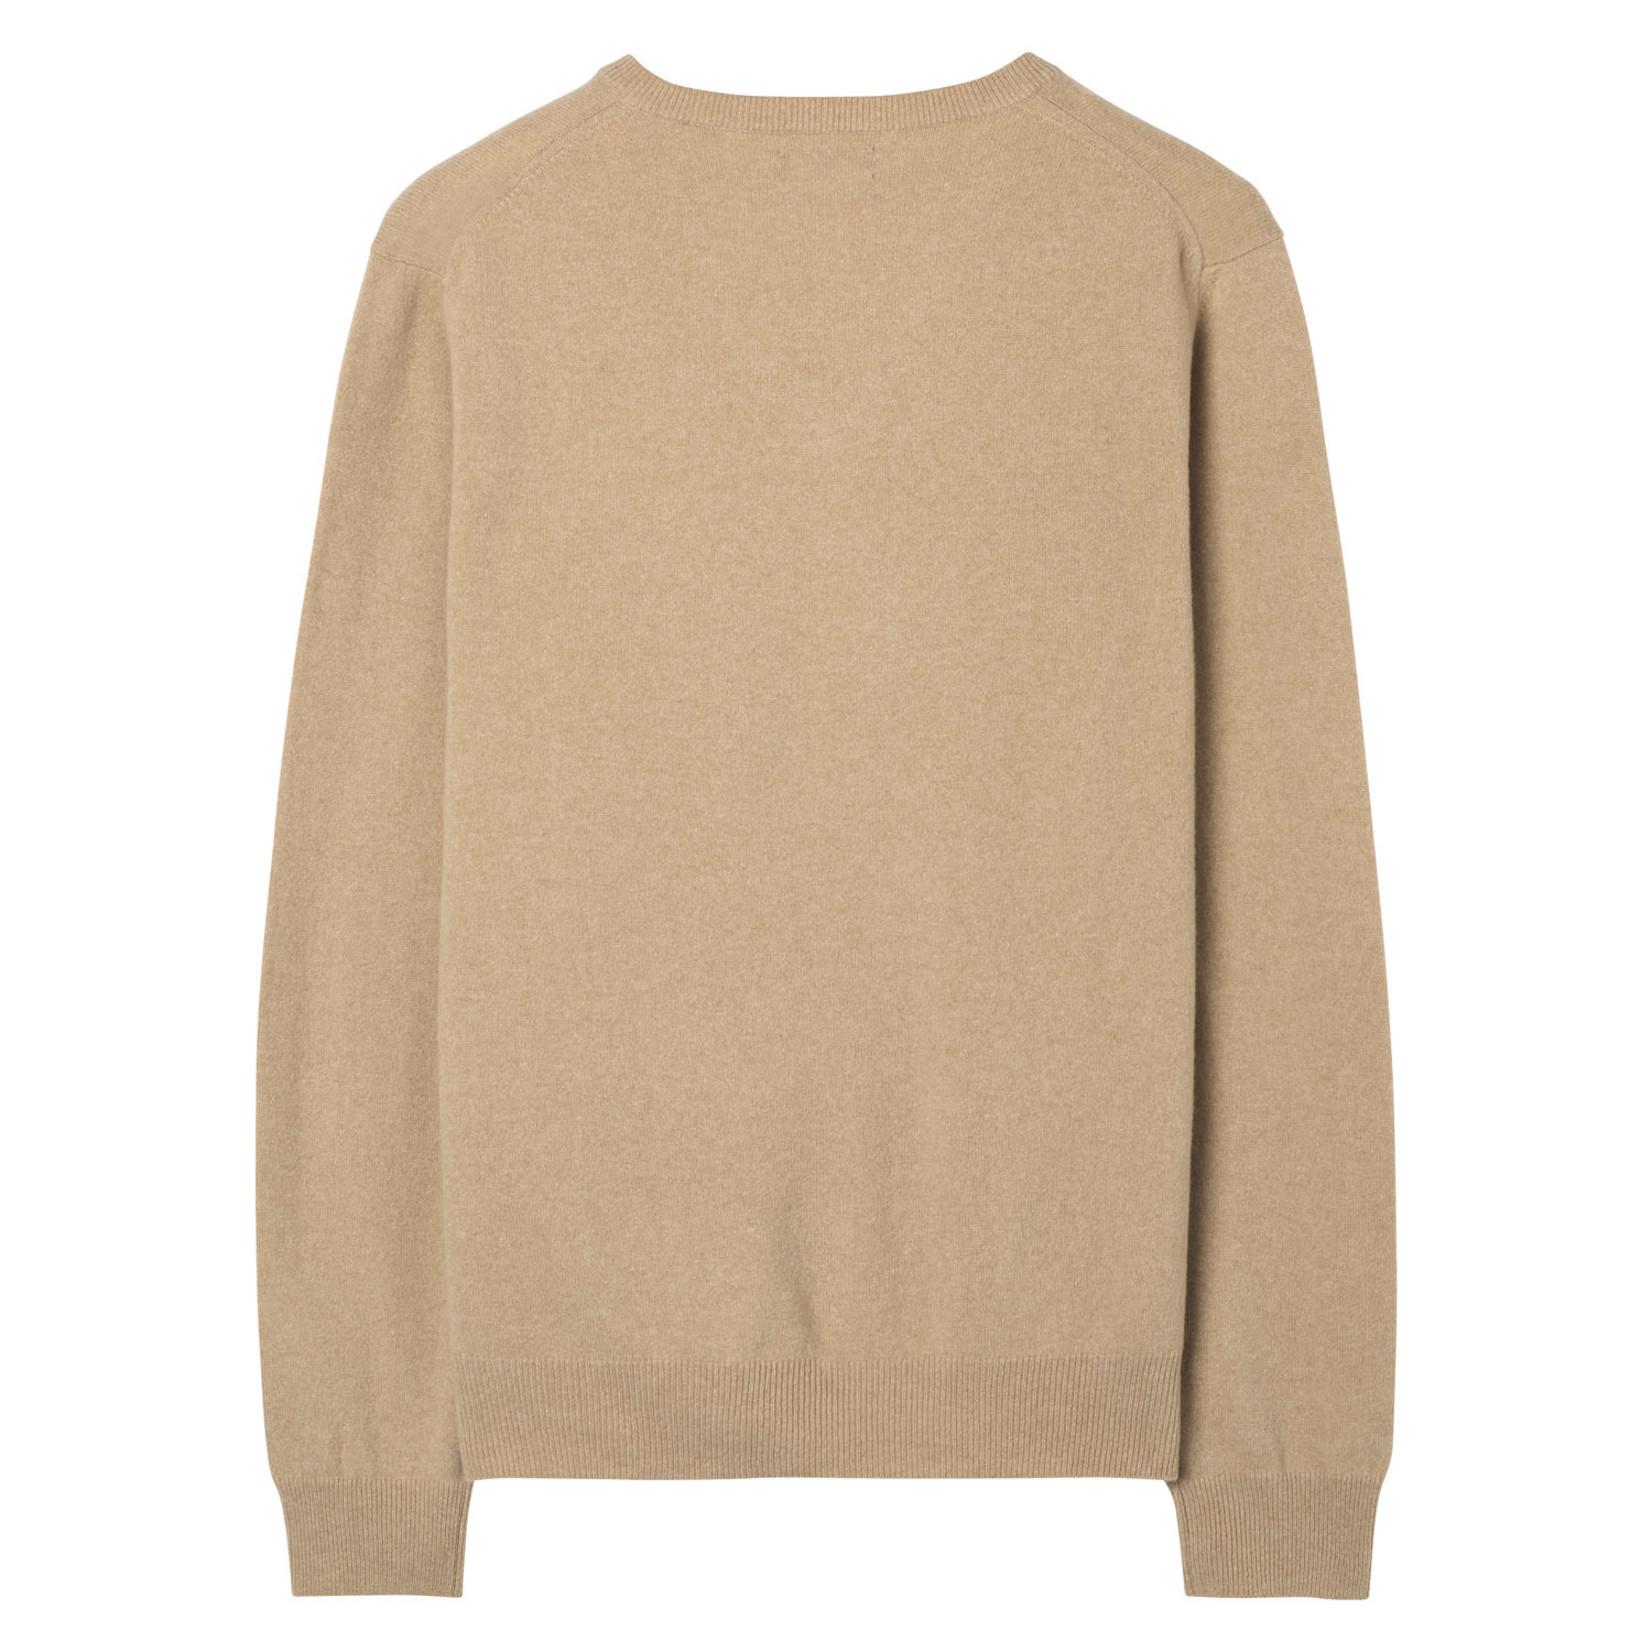 GANT pullover v-hals lamswol zand